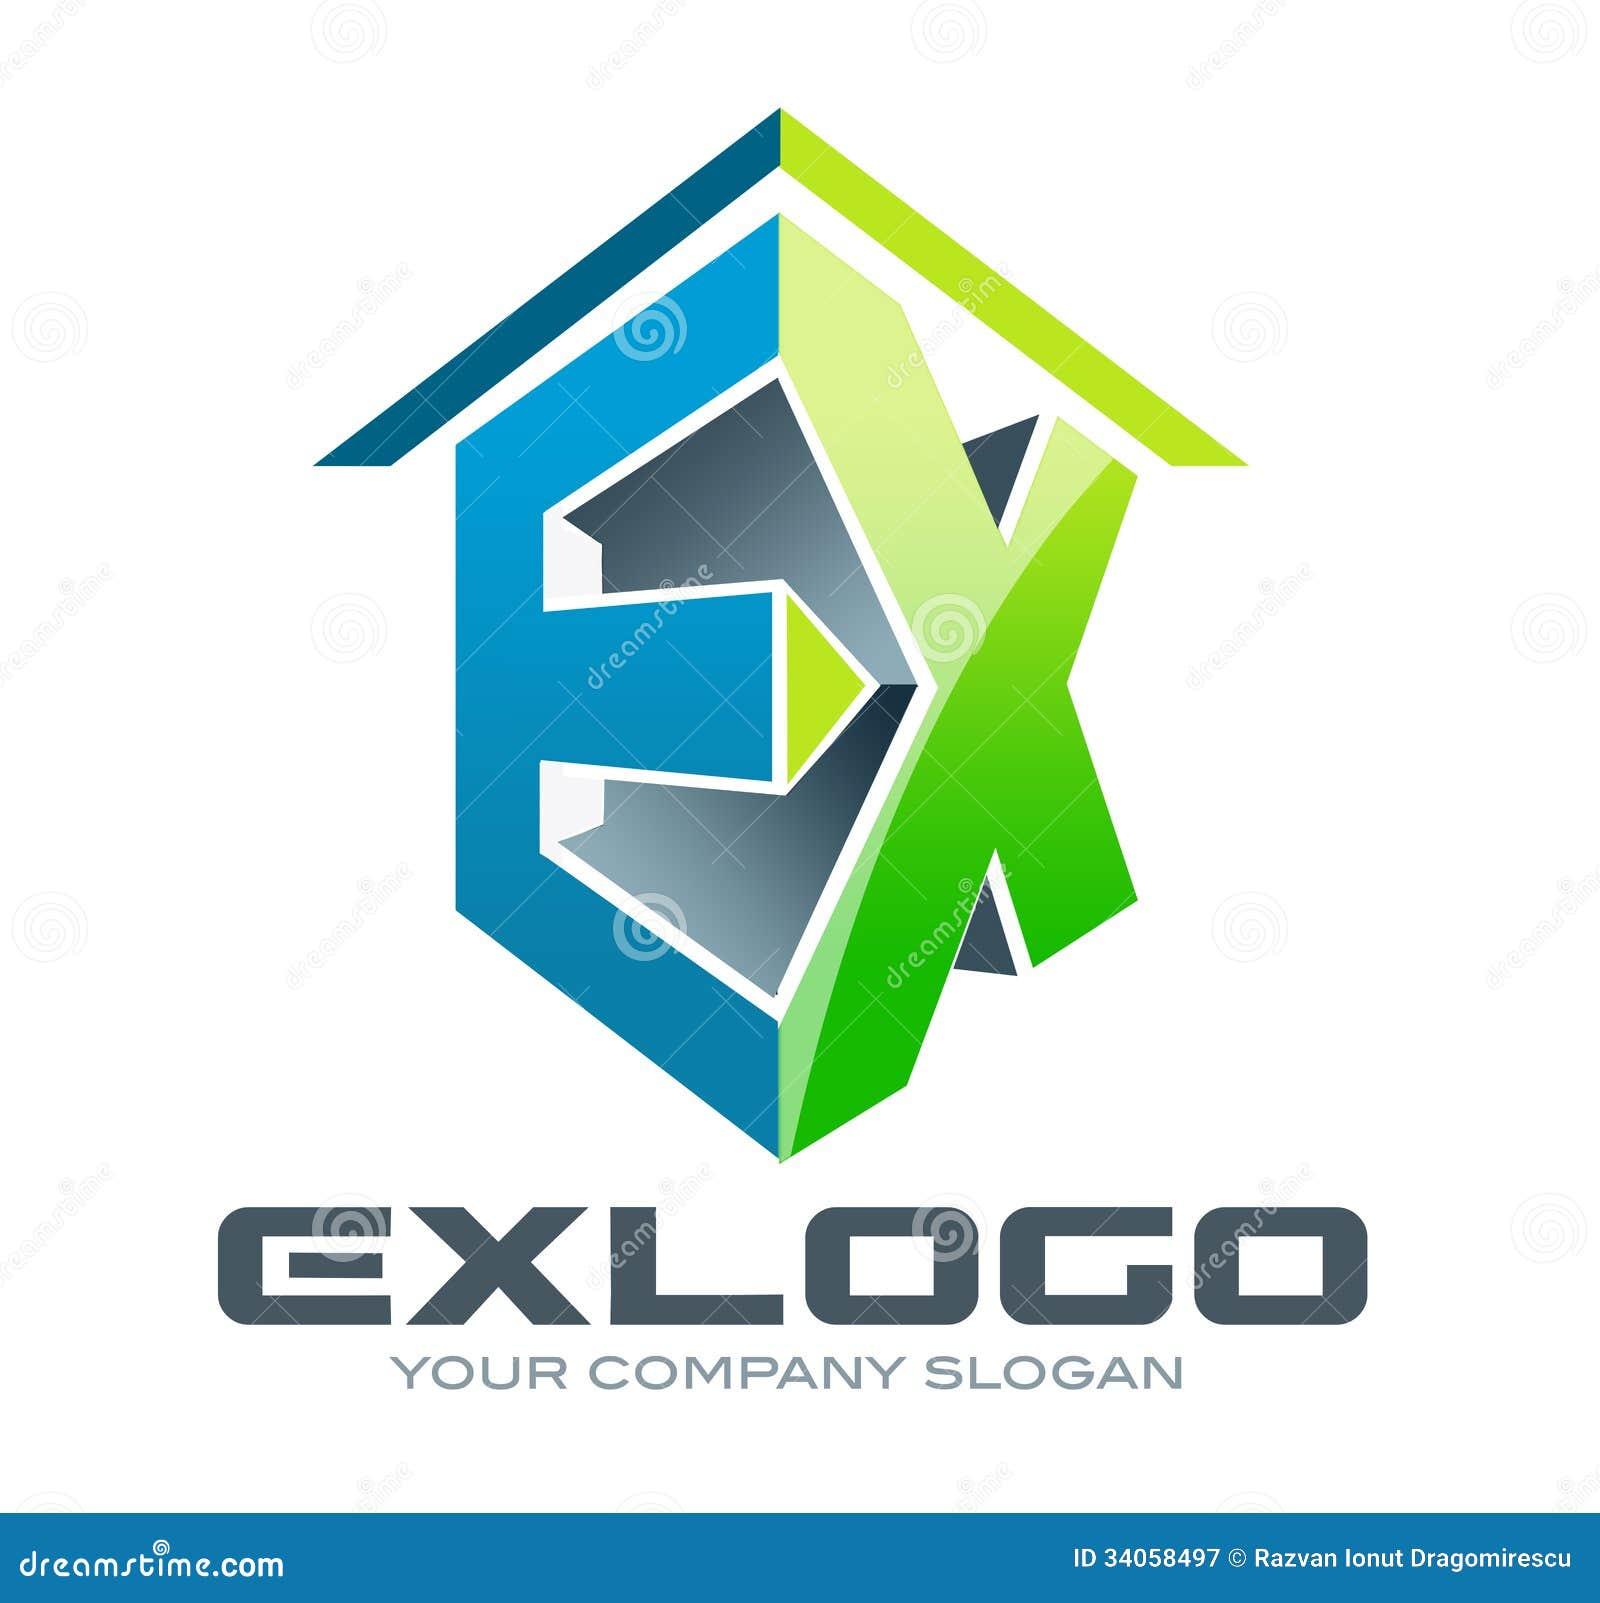 3D Logo EX Royalty Free Stock Photography - Image: 34058497